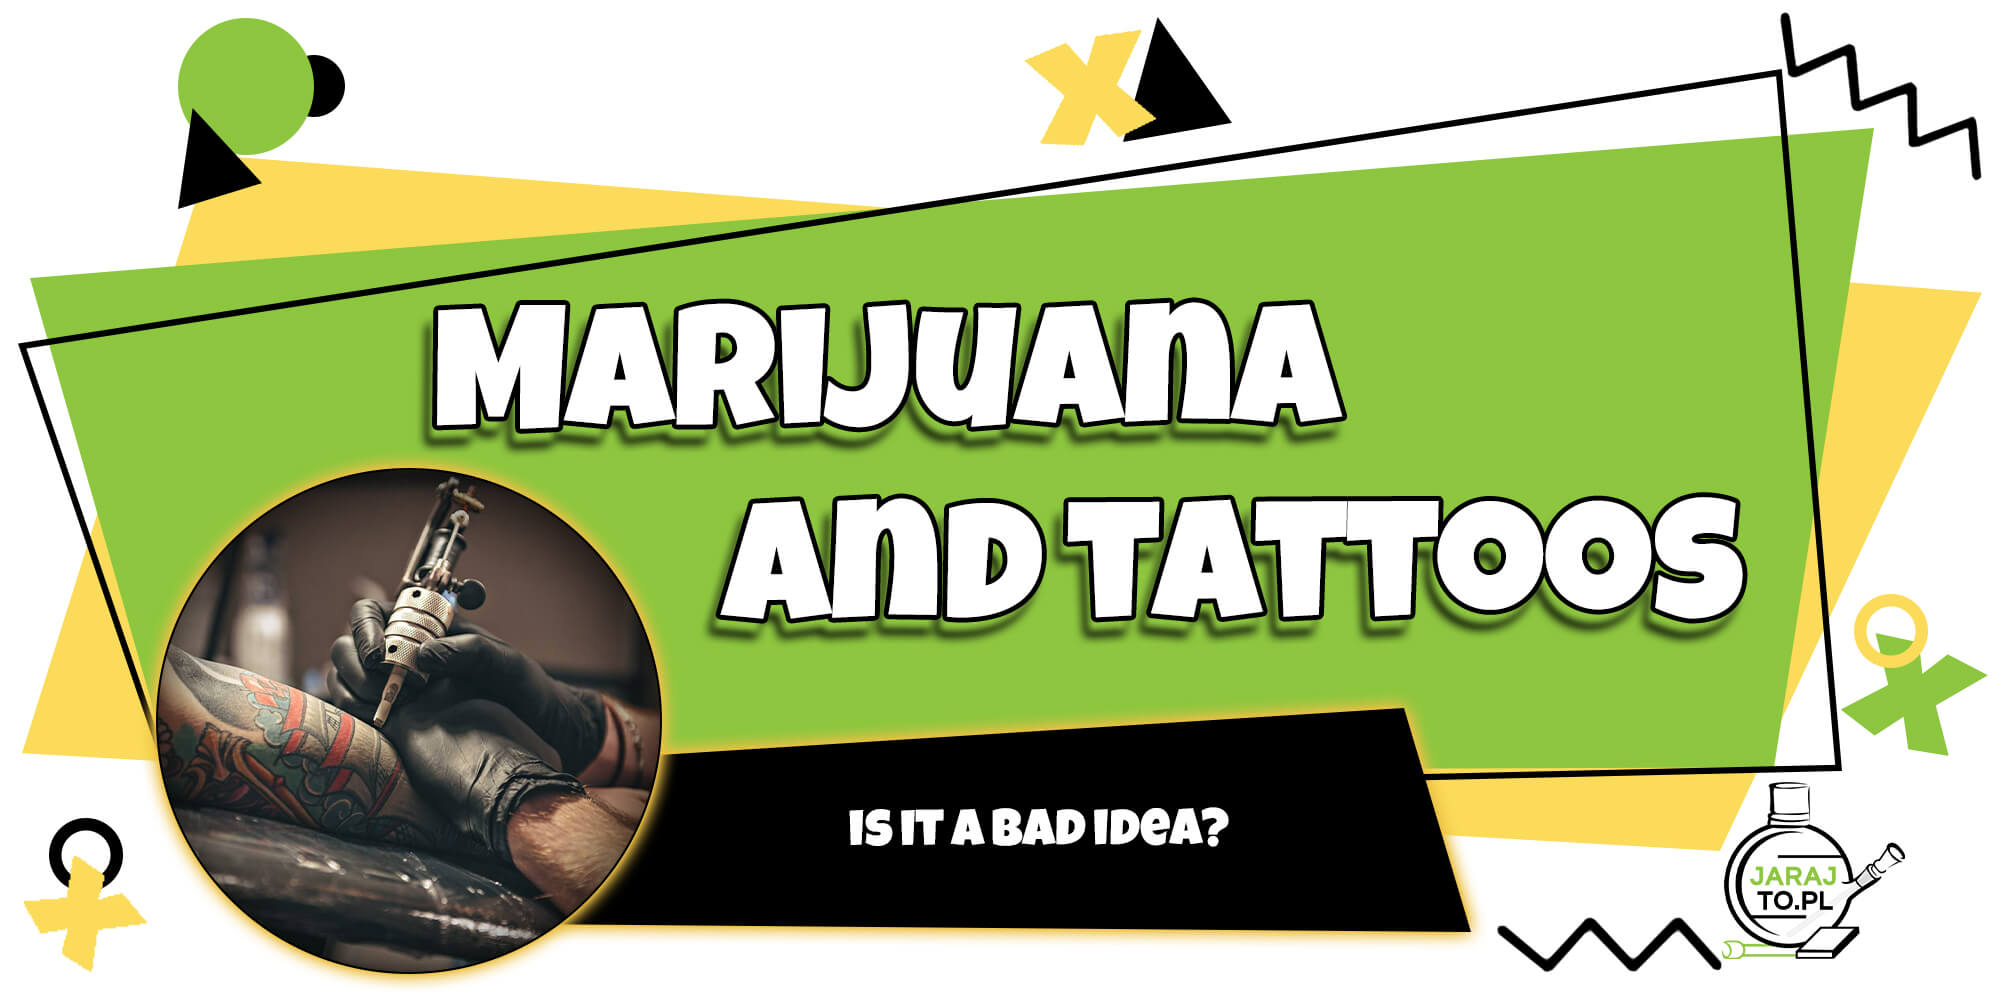 A why bad are idea tattoos Are a